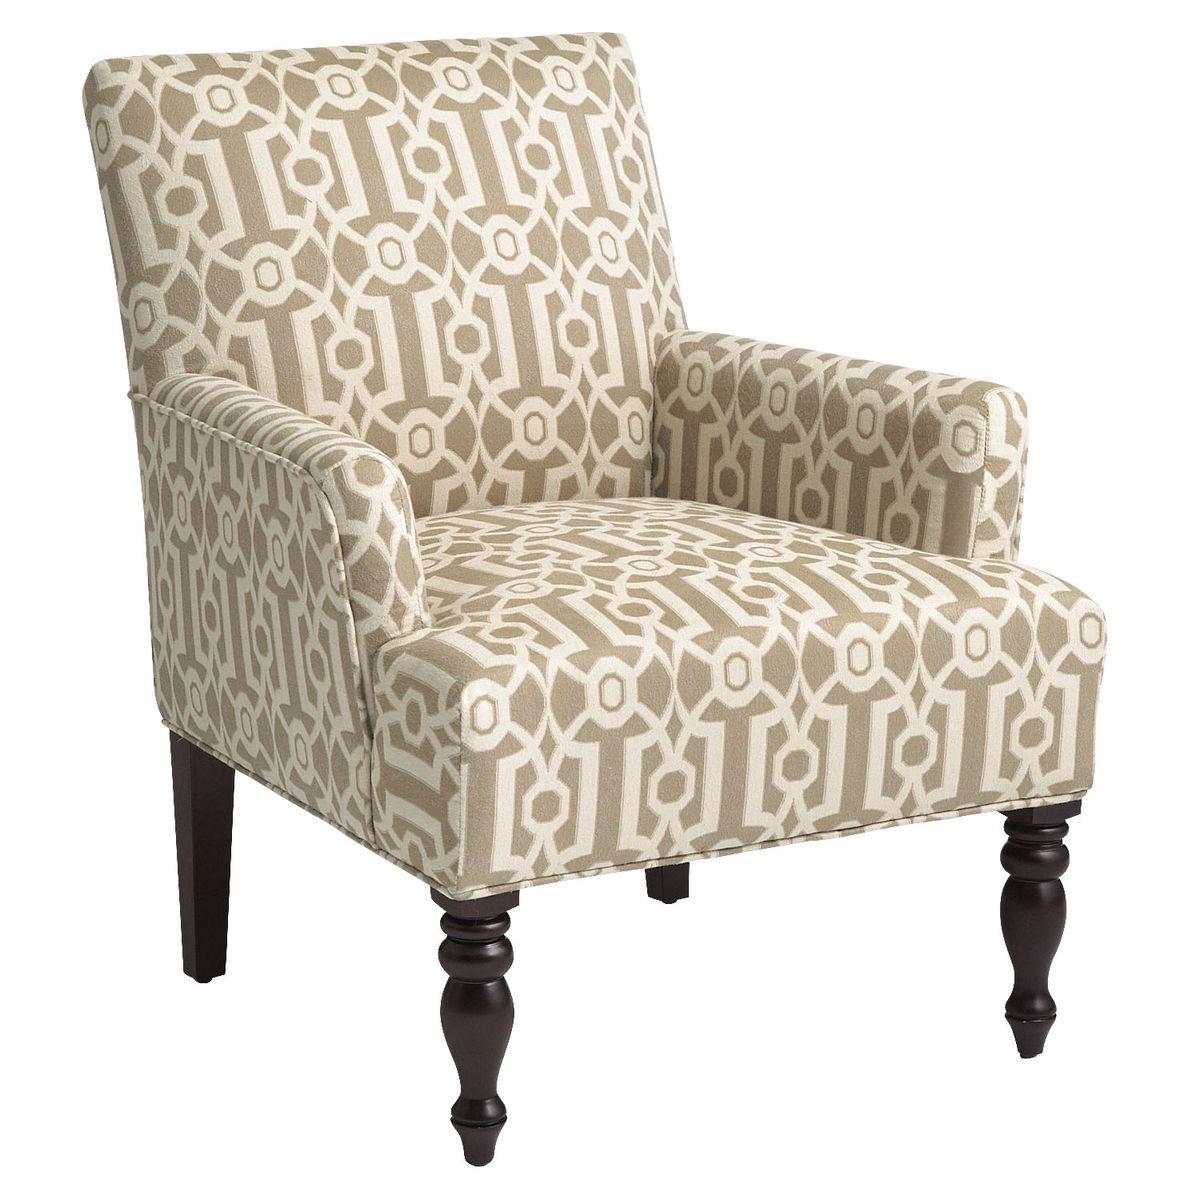 Liliana Chair - Pier 1.jpg